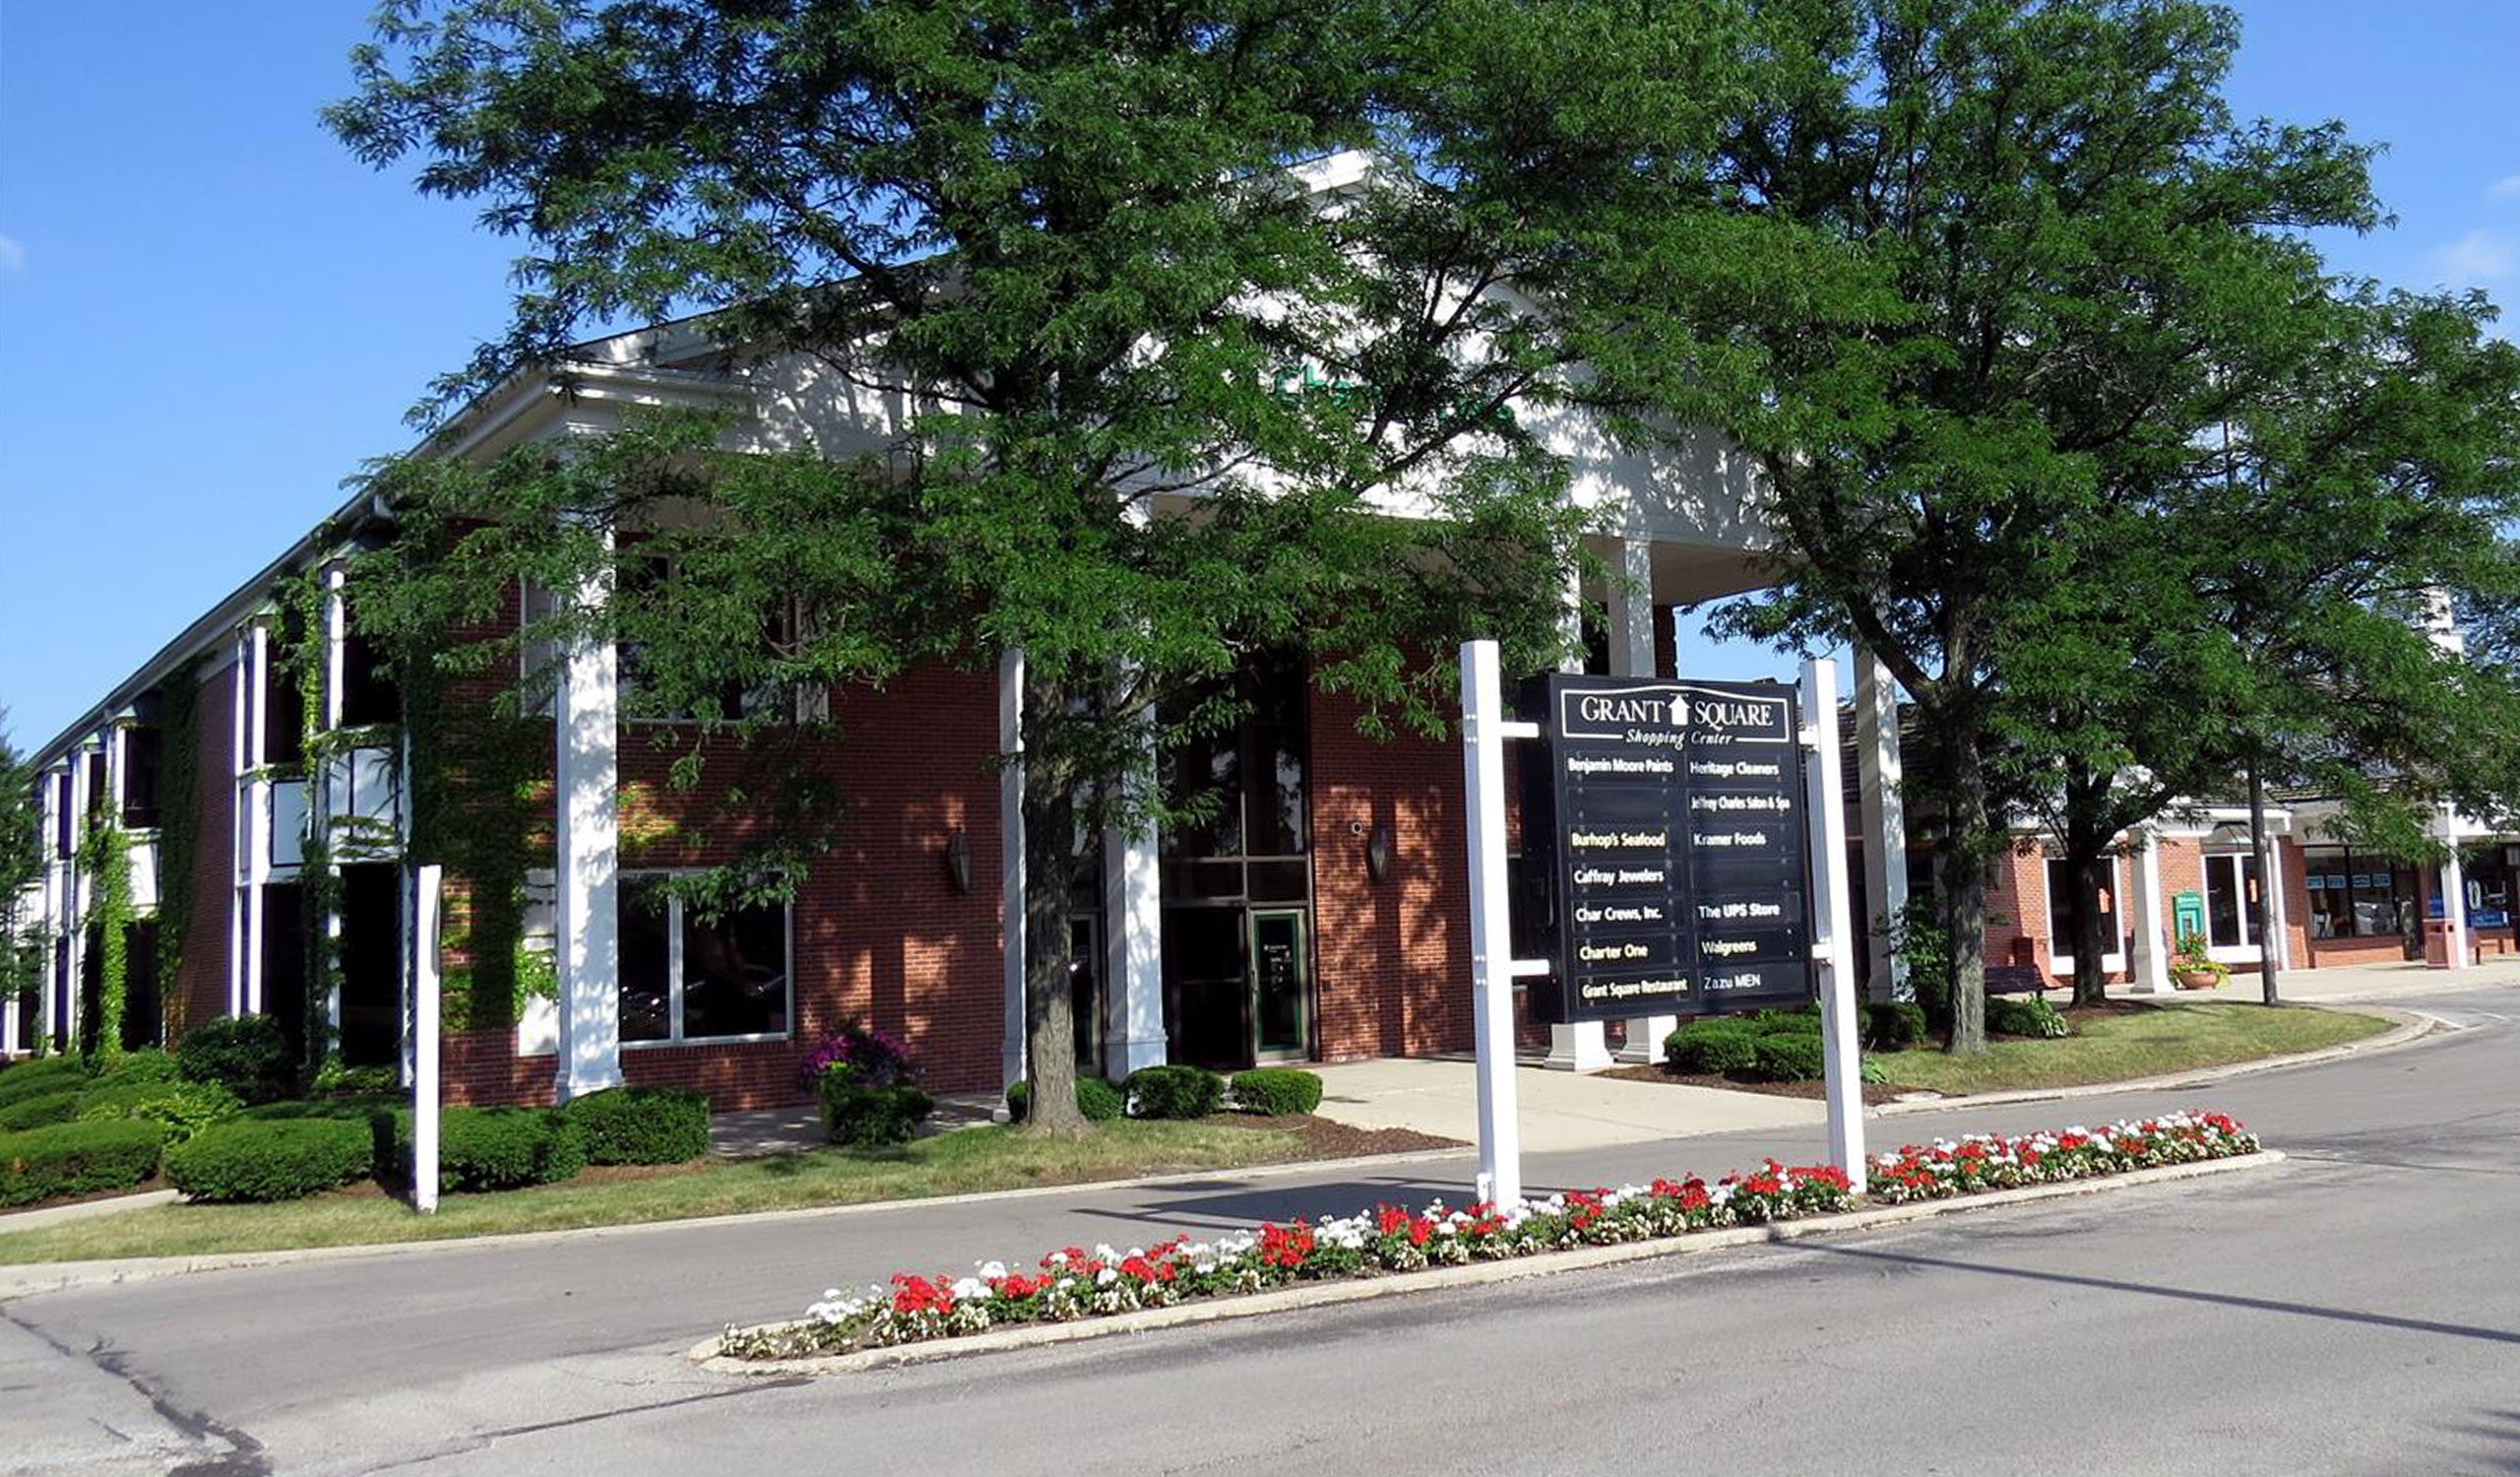 1 Grant Square Hinsdale, Illinois